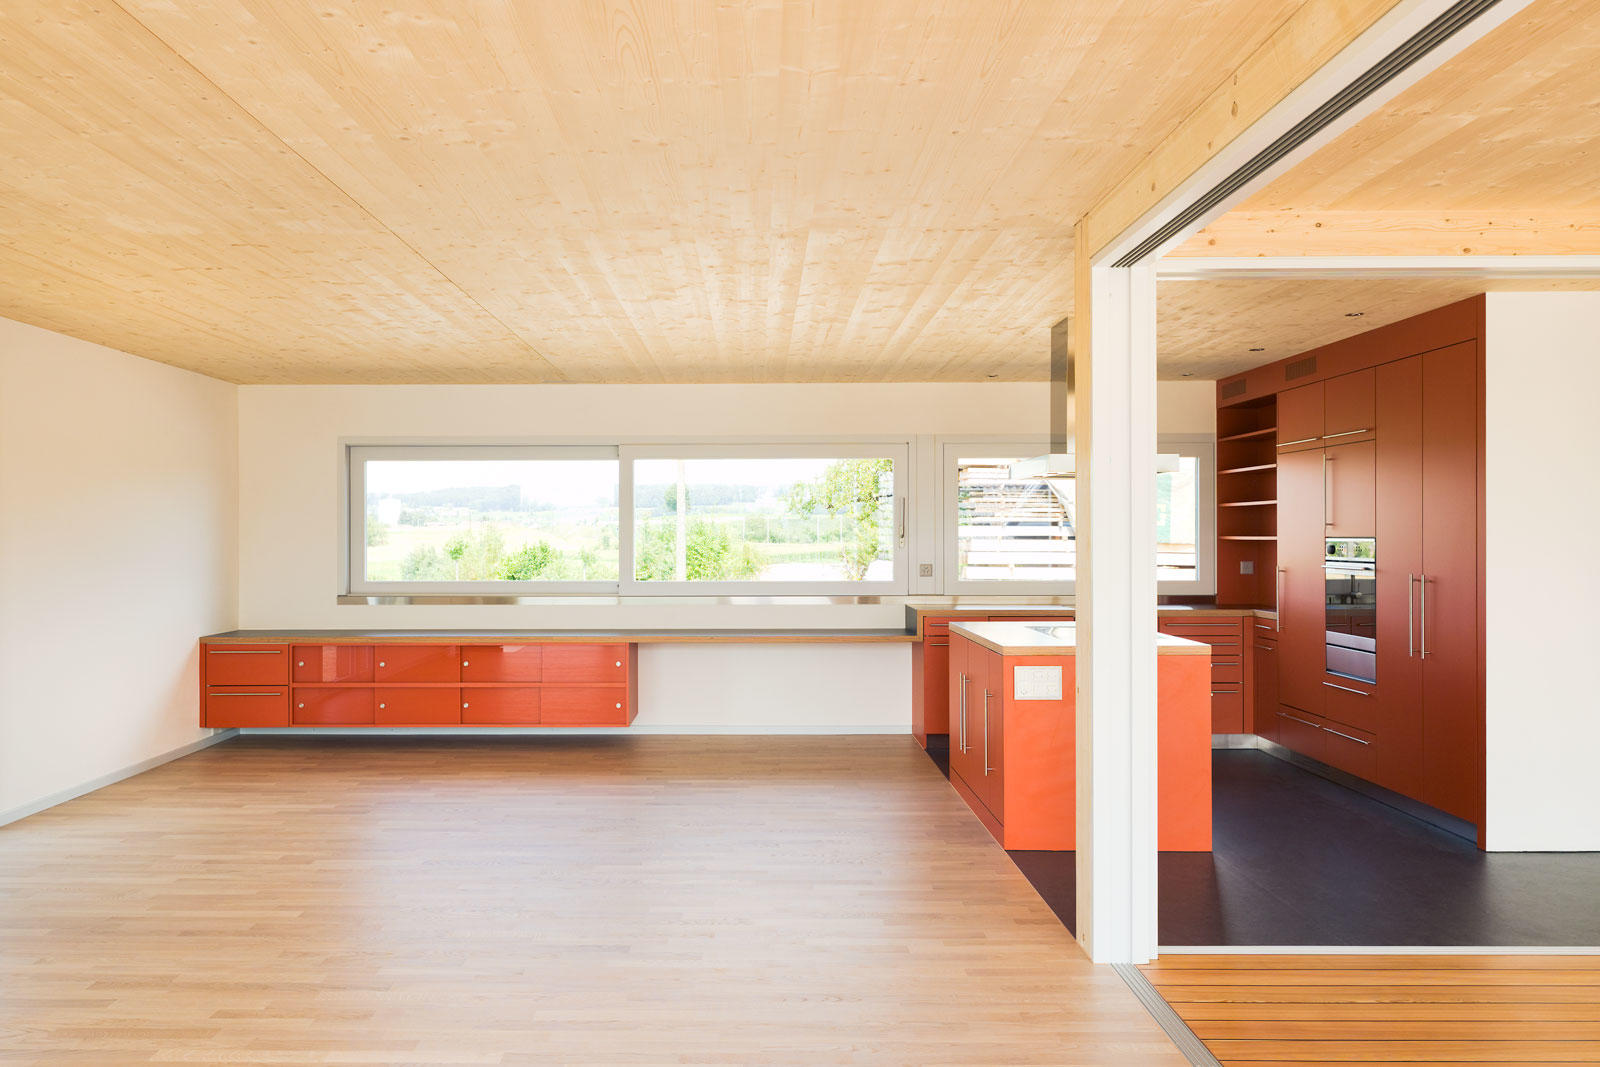 Neubau einfamilienhaus irion architekten ag for Neubau einfamilienhaus